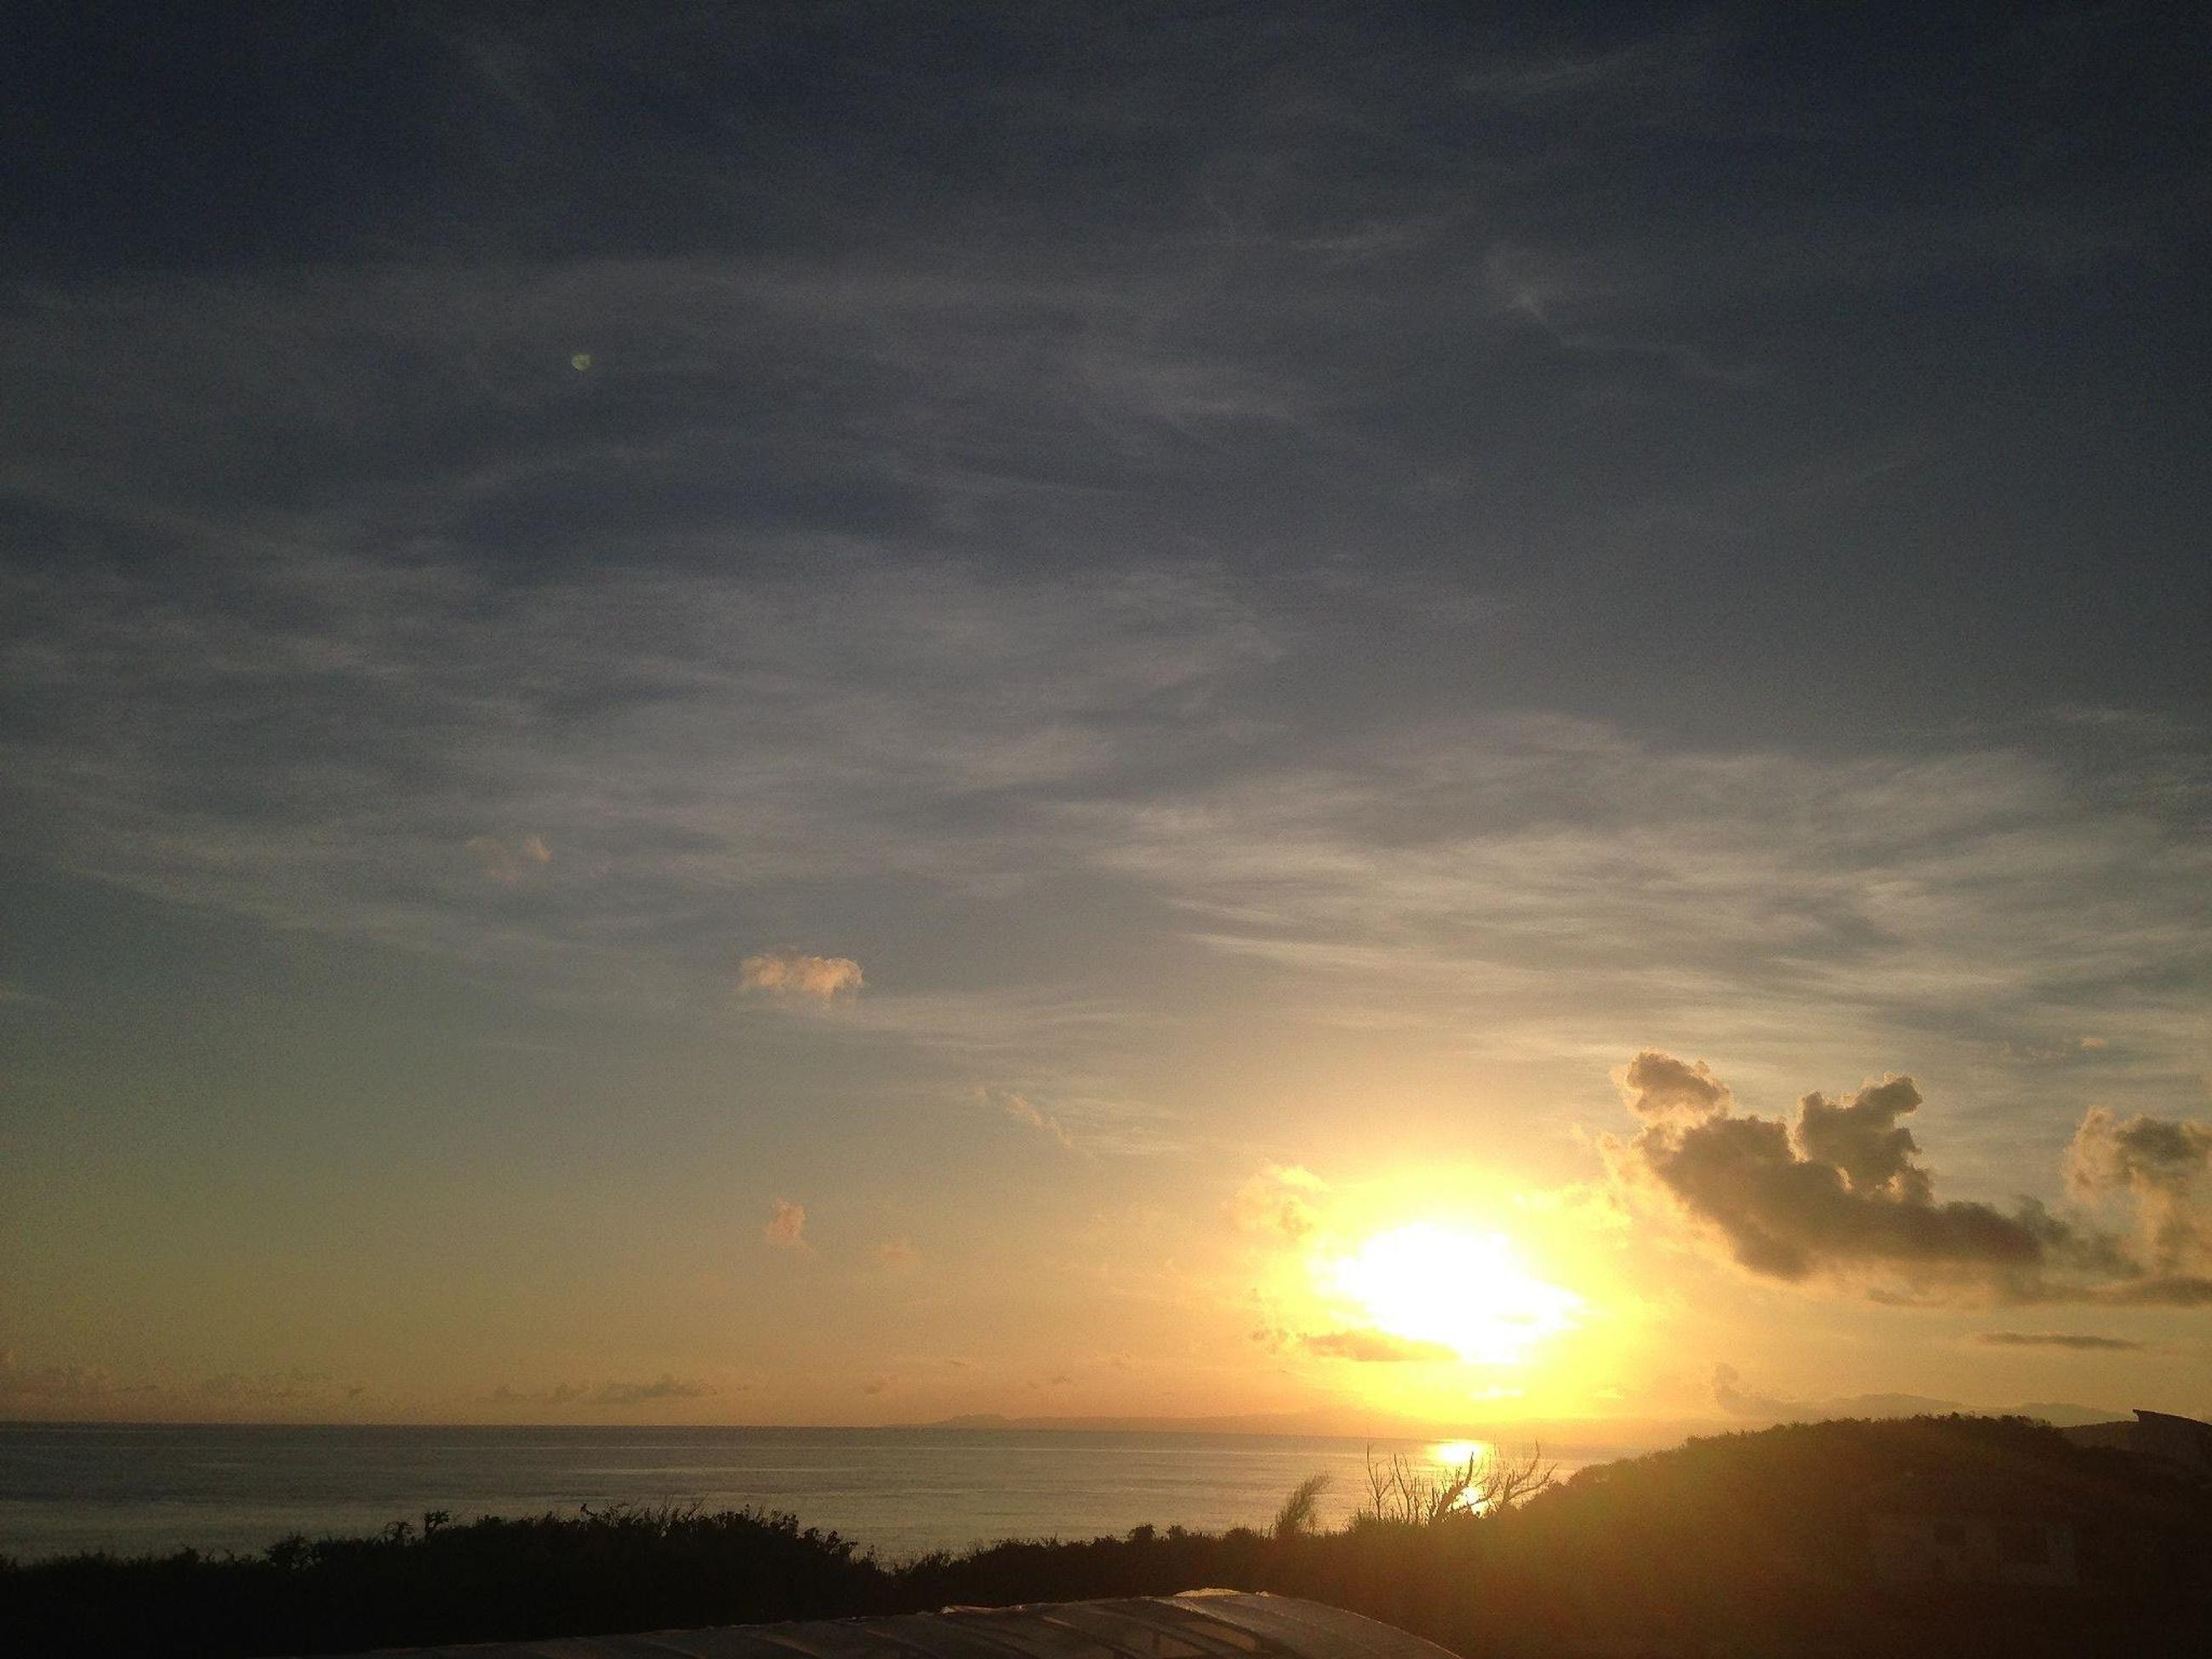 sea, sun, water, horizon over water, sunset, scenics, tranquil scene, beach, beauty in nature, tranquility, sky, shore, sunlight, nature, idyllic, sunbeam, lens flare, reflection, cloud - sky, outdoors